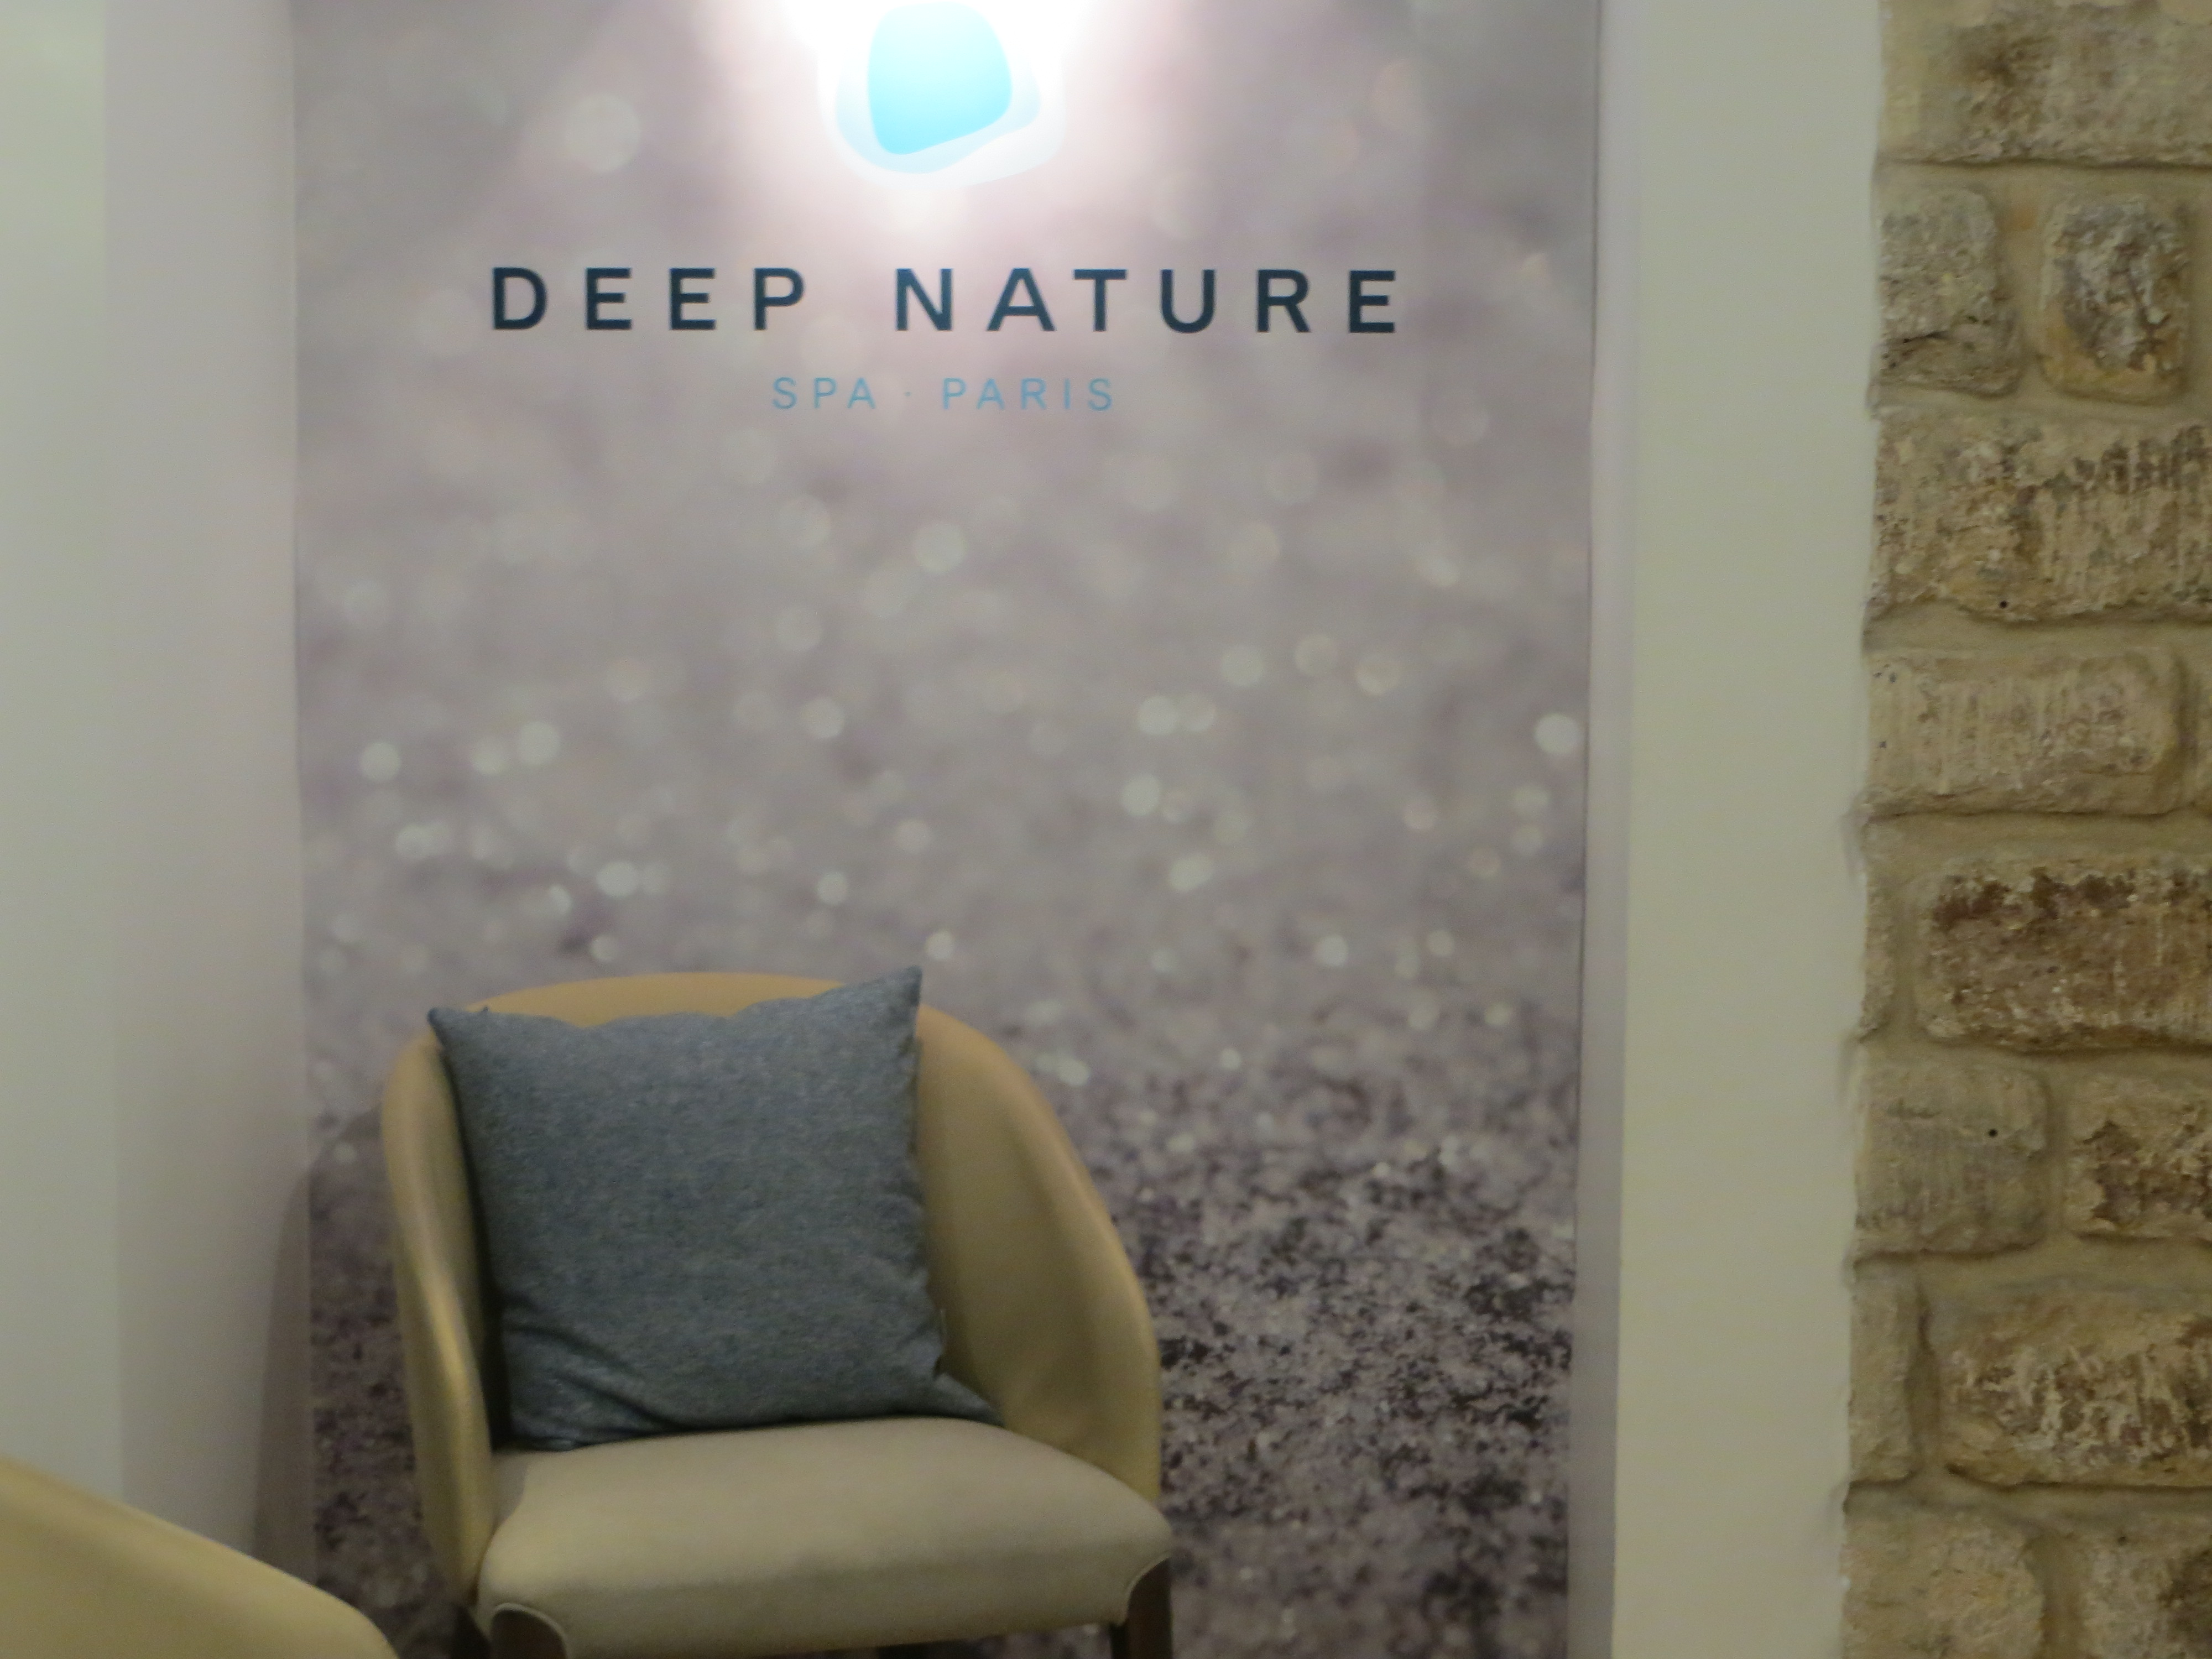 Hotel Saint James & Albany Paris - Deep nature spa